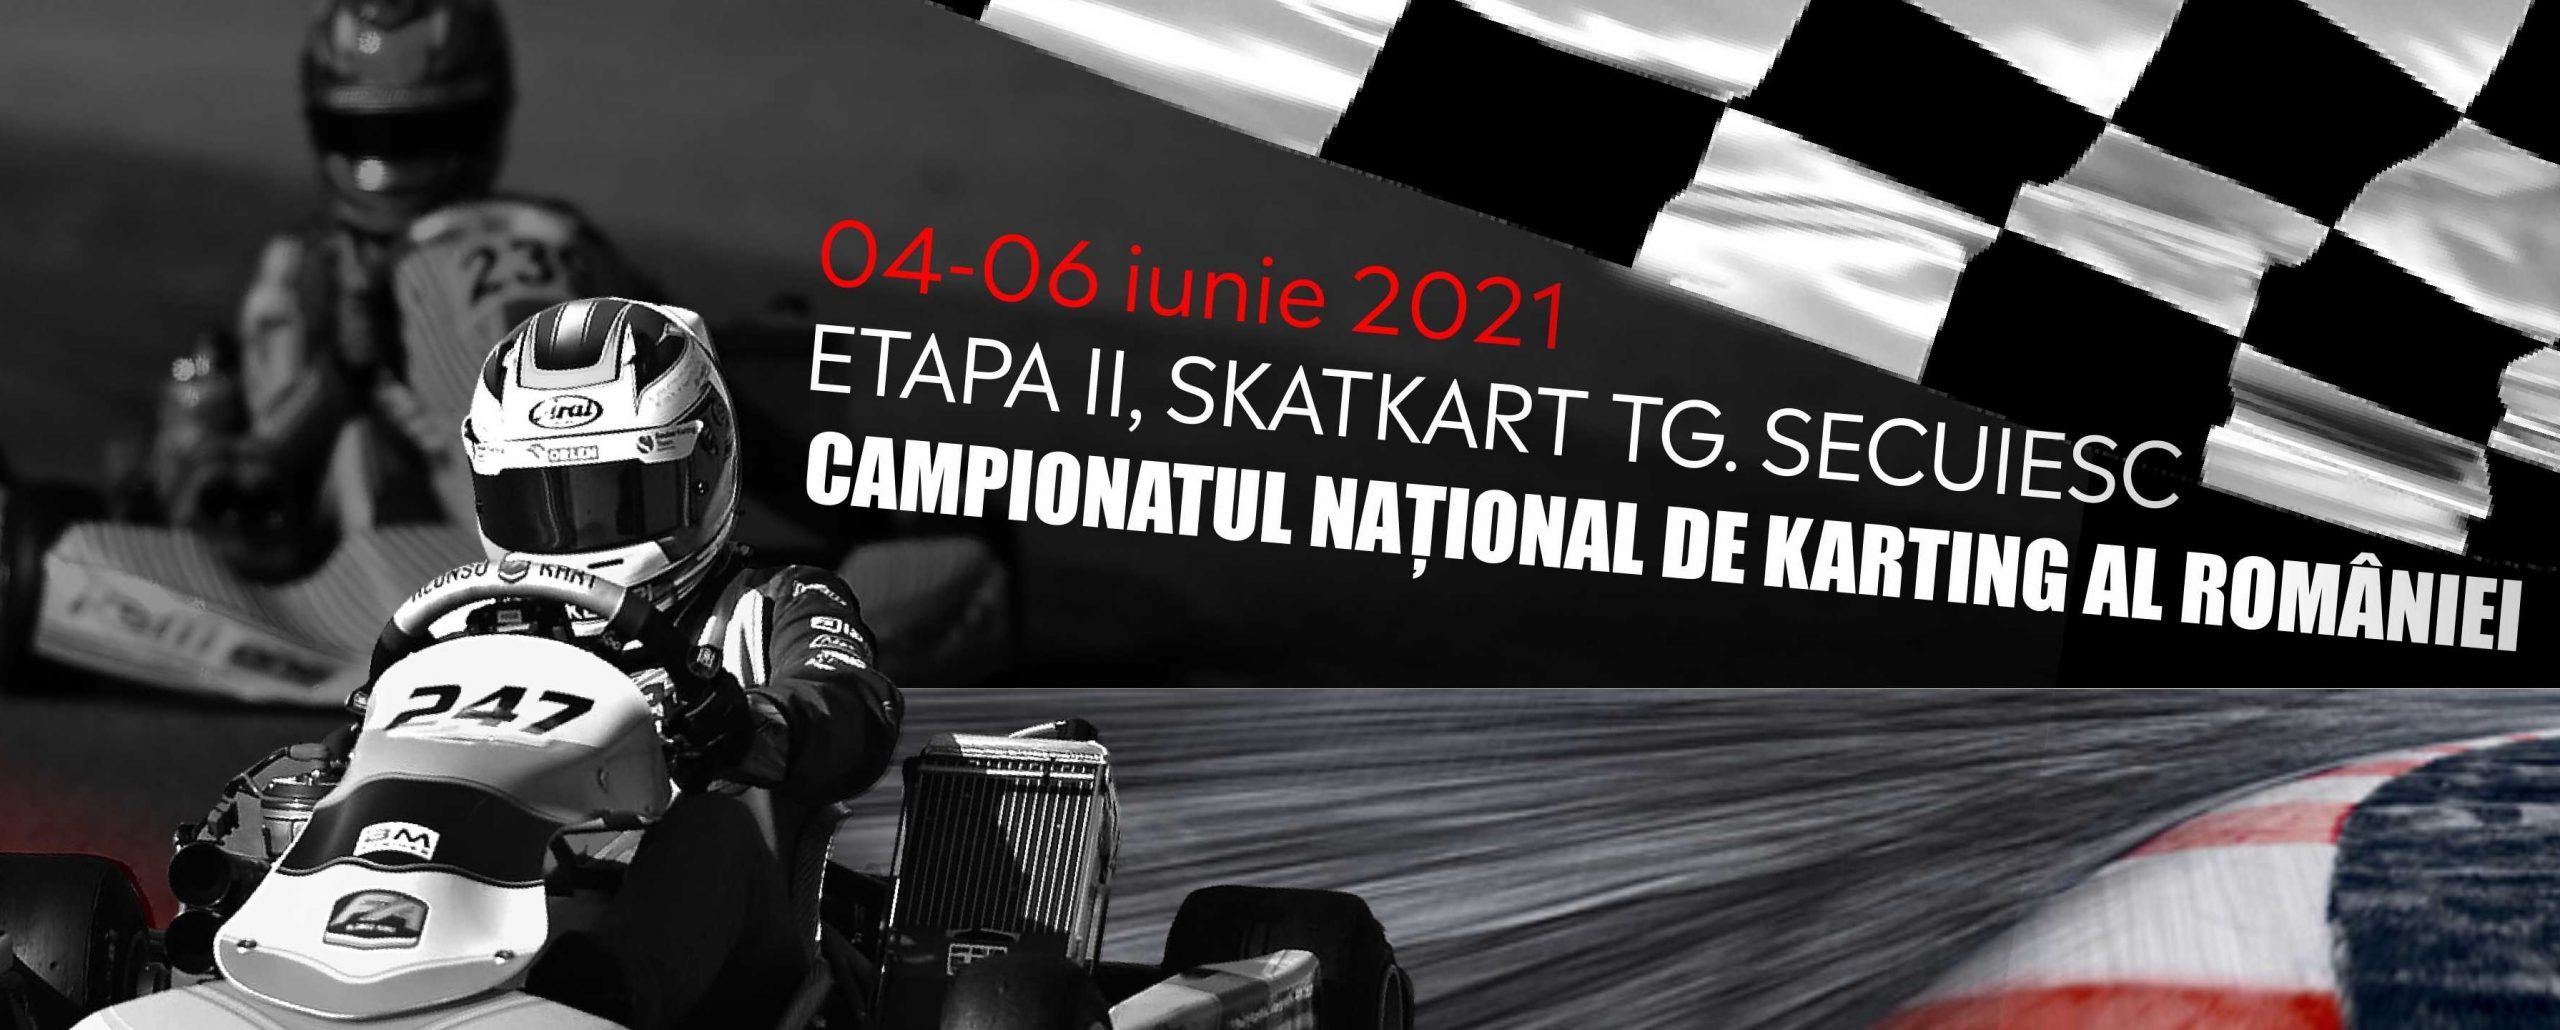 LIVE VIDEO Campionatul Naţional de Karting, etapa a 2-a